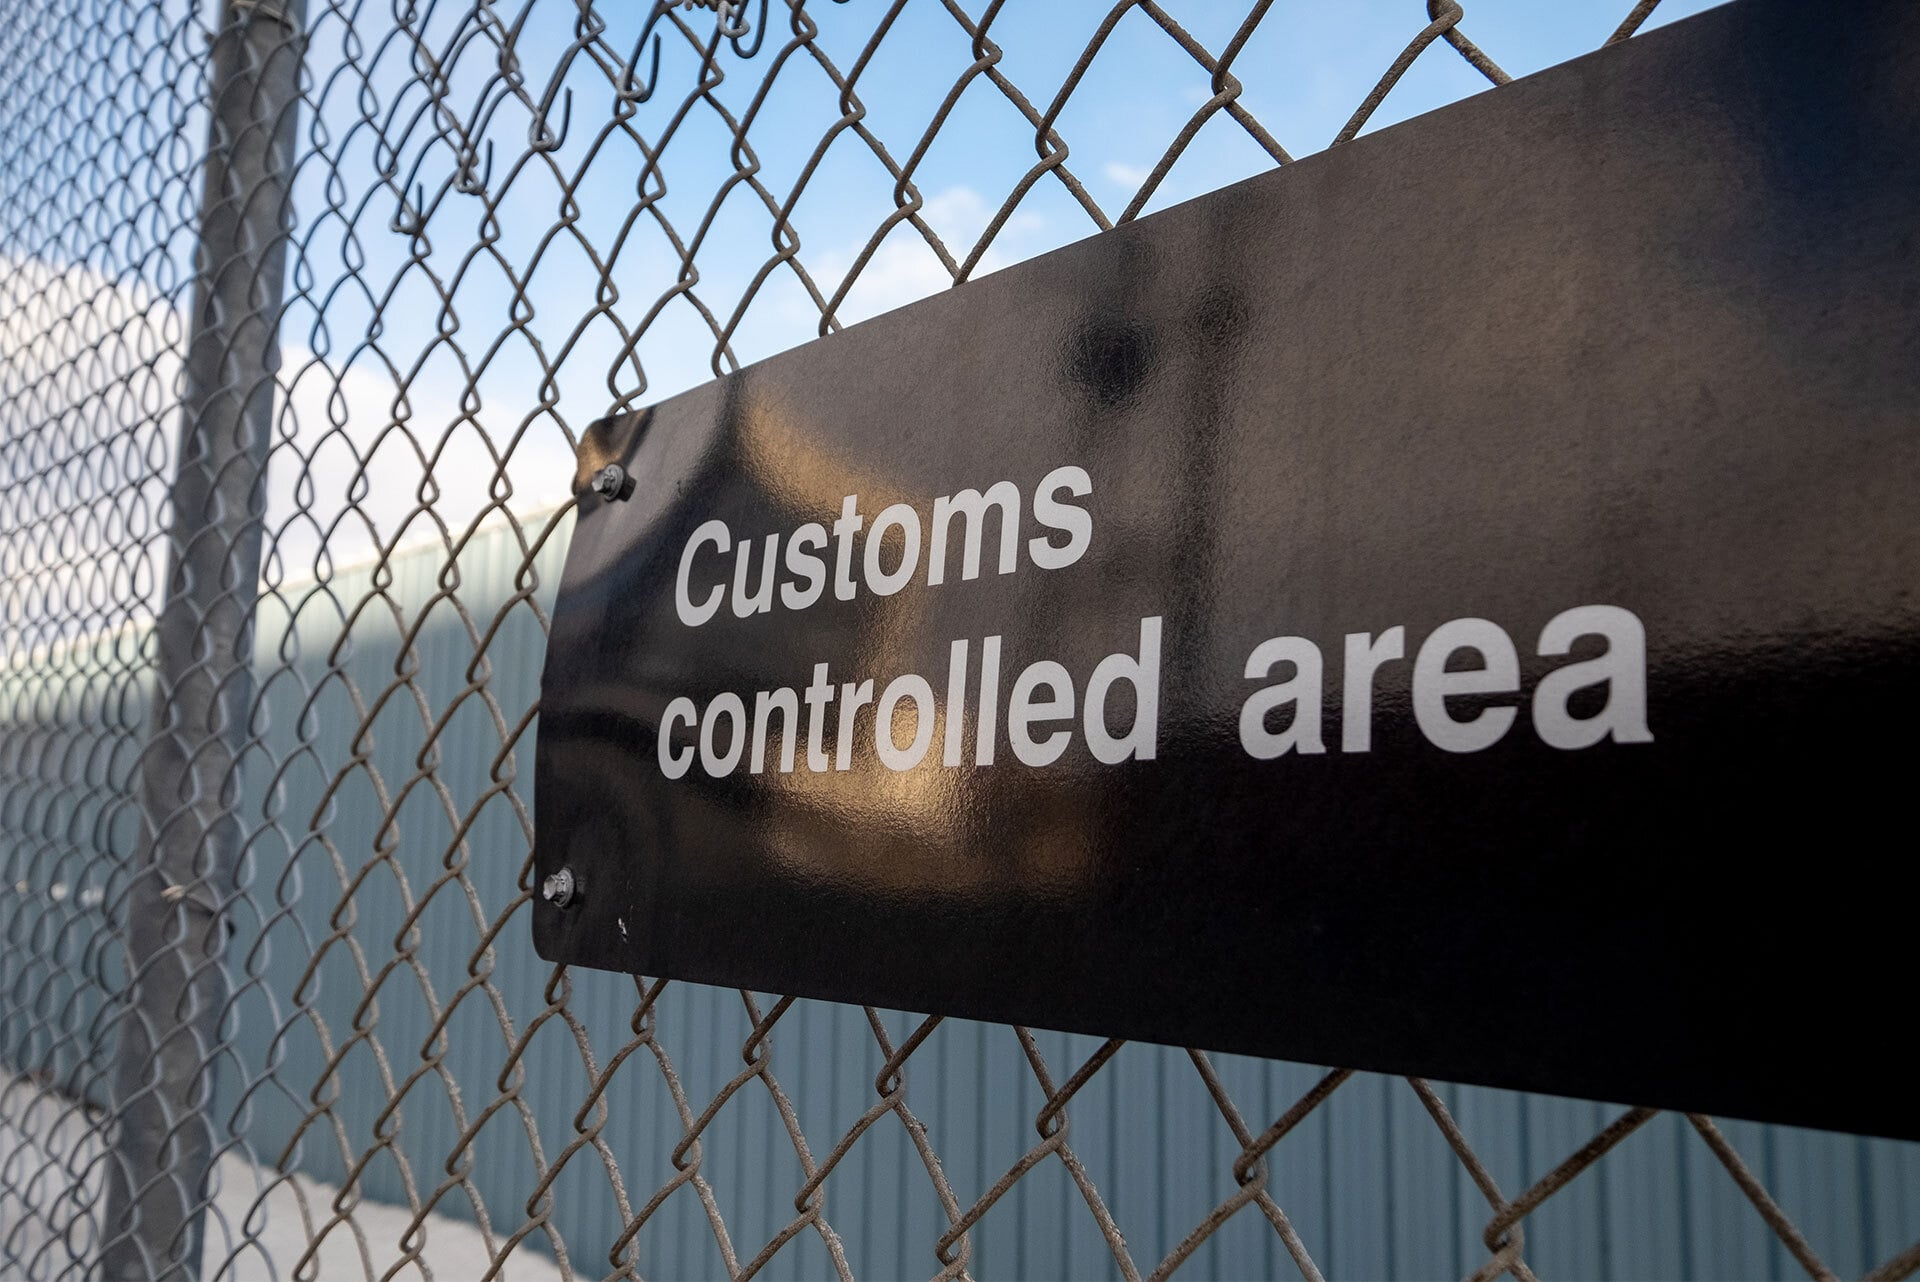 Customs controlled area board